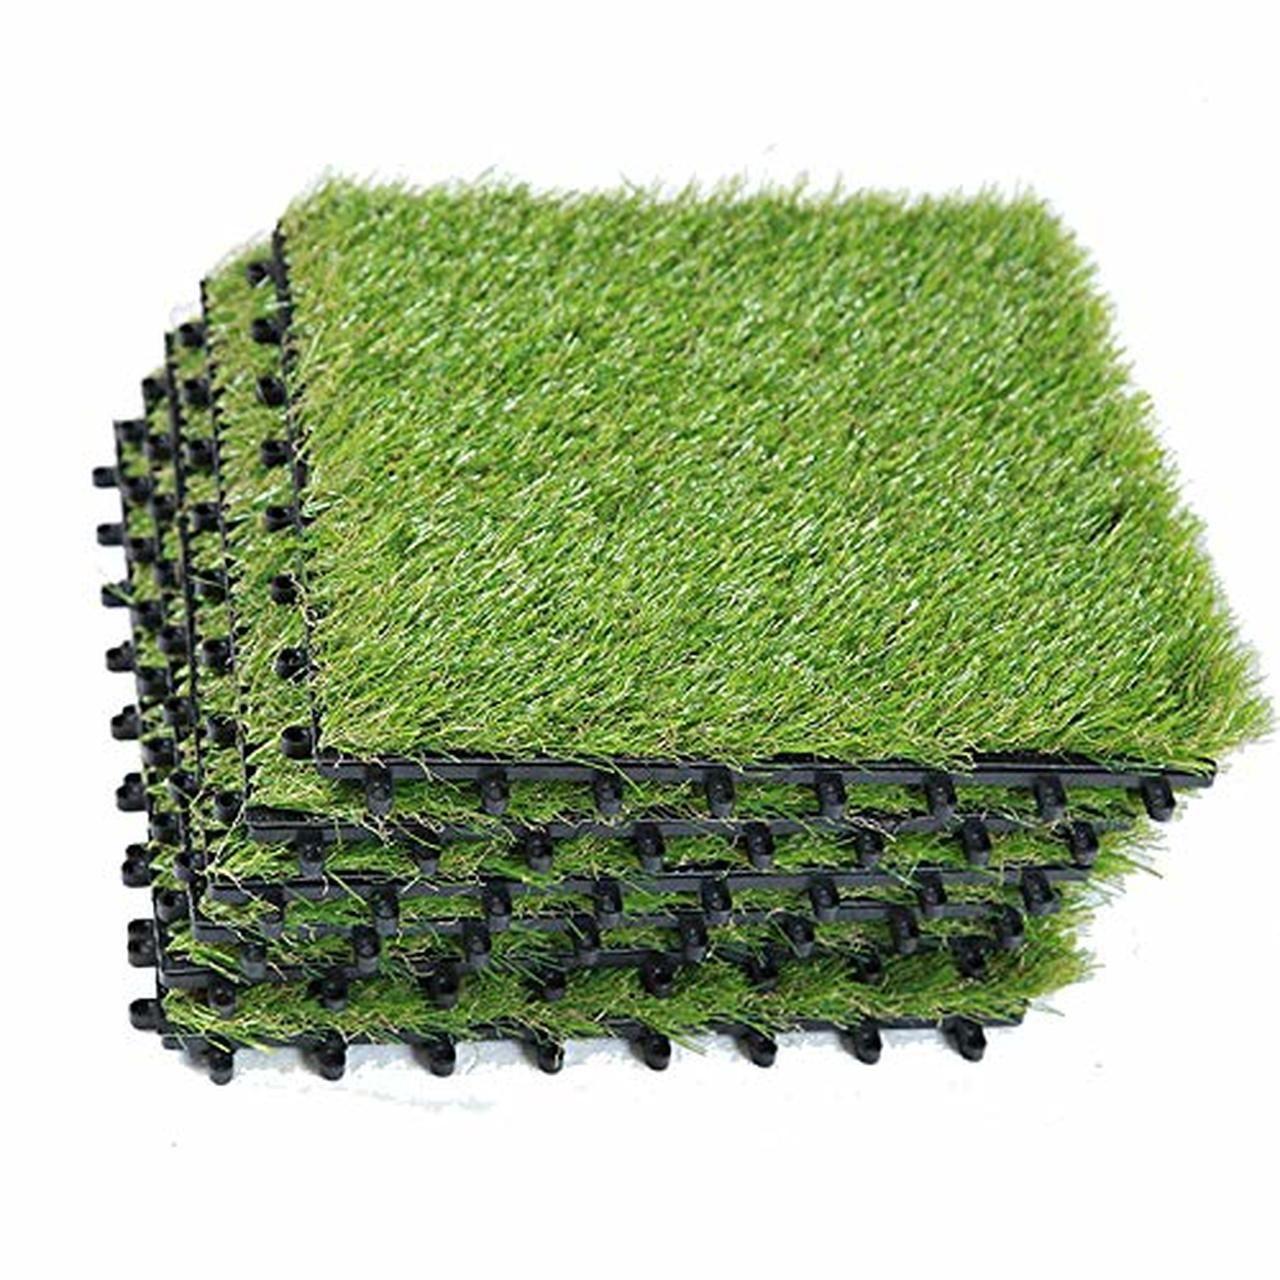 Ecomatrix Artificial Grass Tiles Interlocking Fake Grass Deck Tile Synthetic Grass Turf Green Lawn Carpet Indoor Floor Mat For Patio Balcony Garden Flooring Dec Fake Grass Fake Grass Balcony Artificial Grass